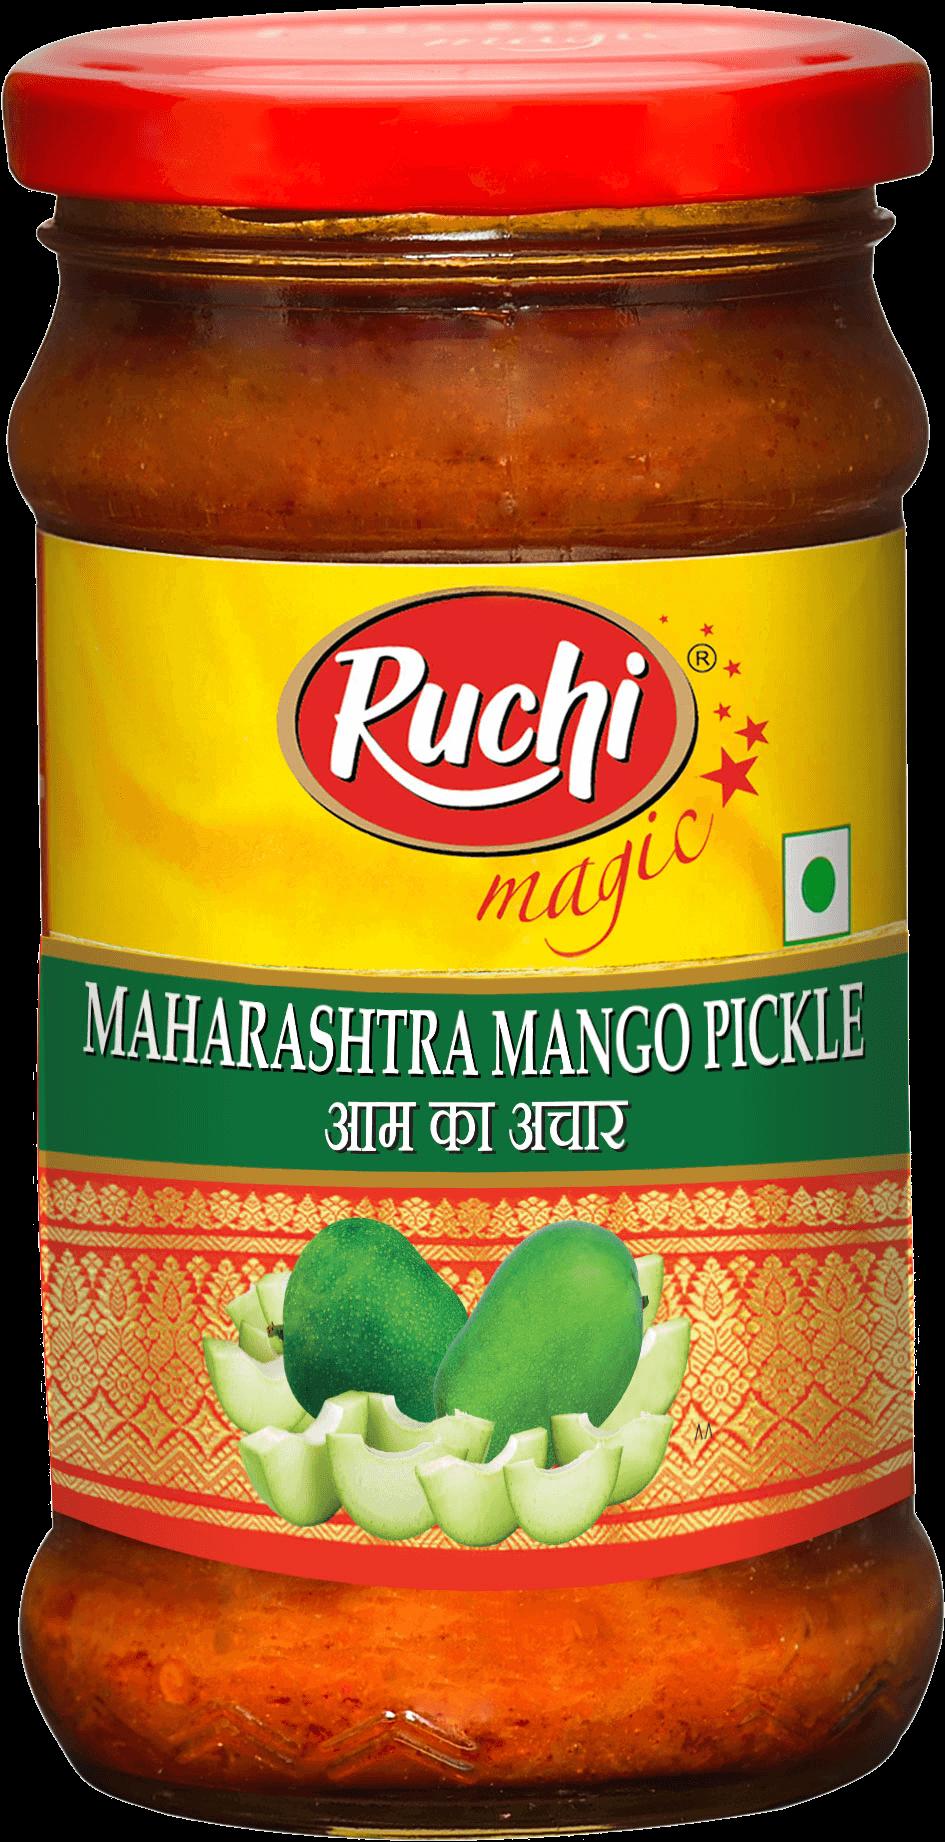 Ruchi – Maharastra Mango Pickle